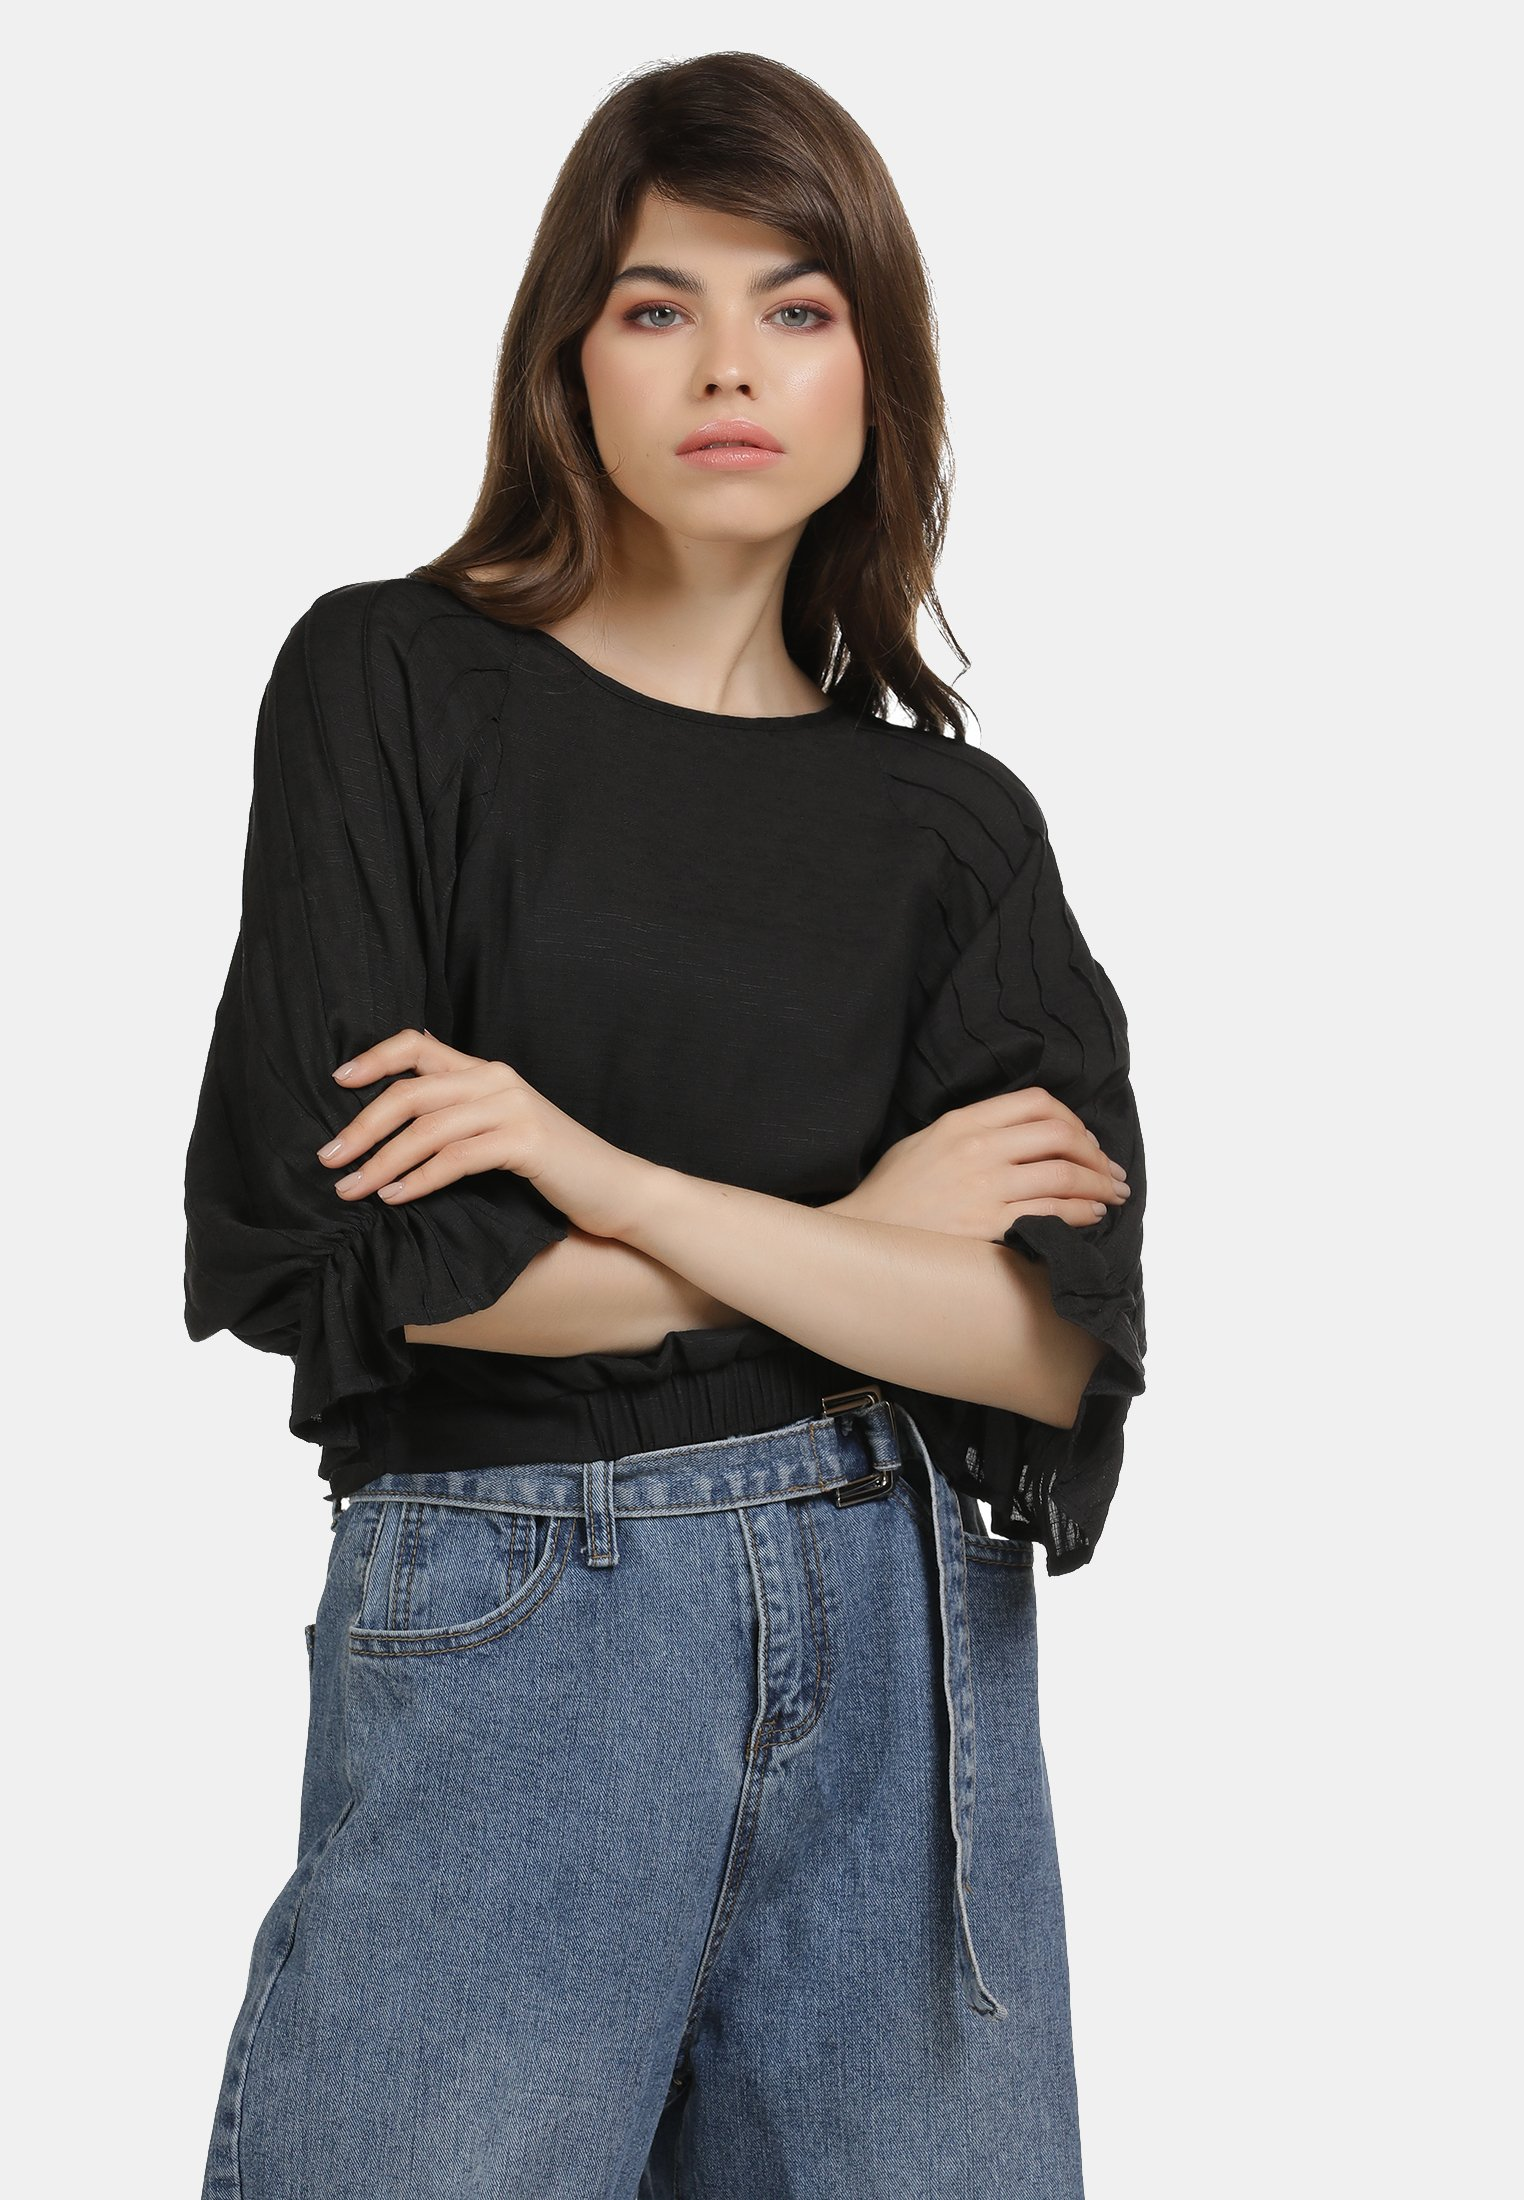 Low Cost Women's Clothing myMo Blouse schwarz mqXewalY6